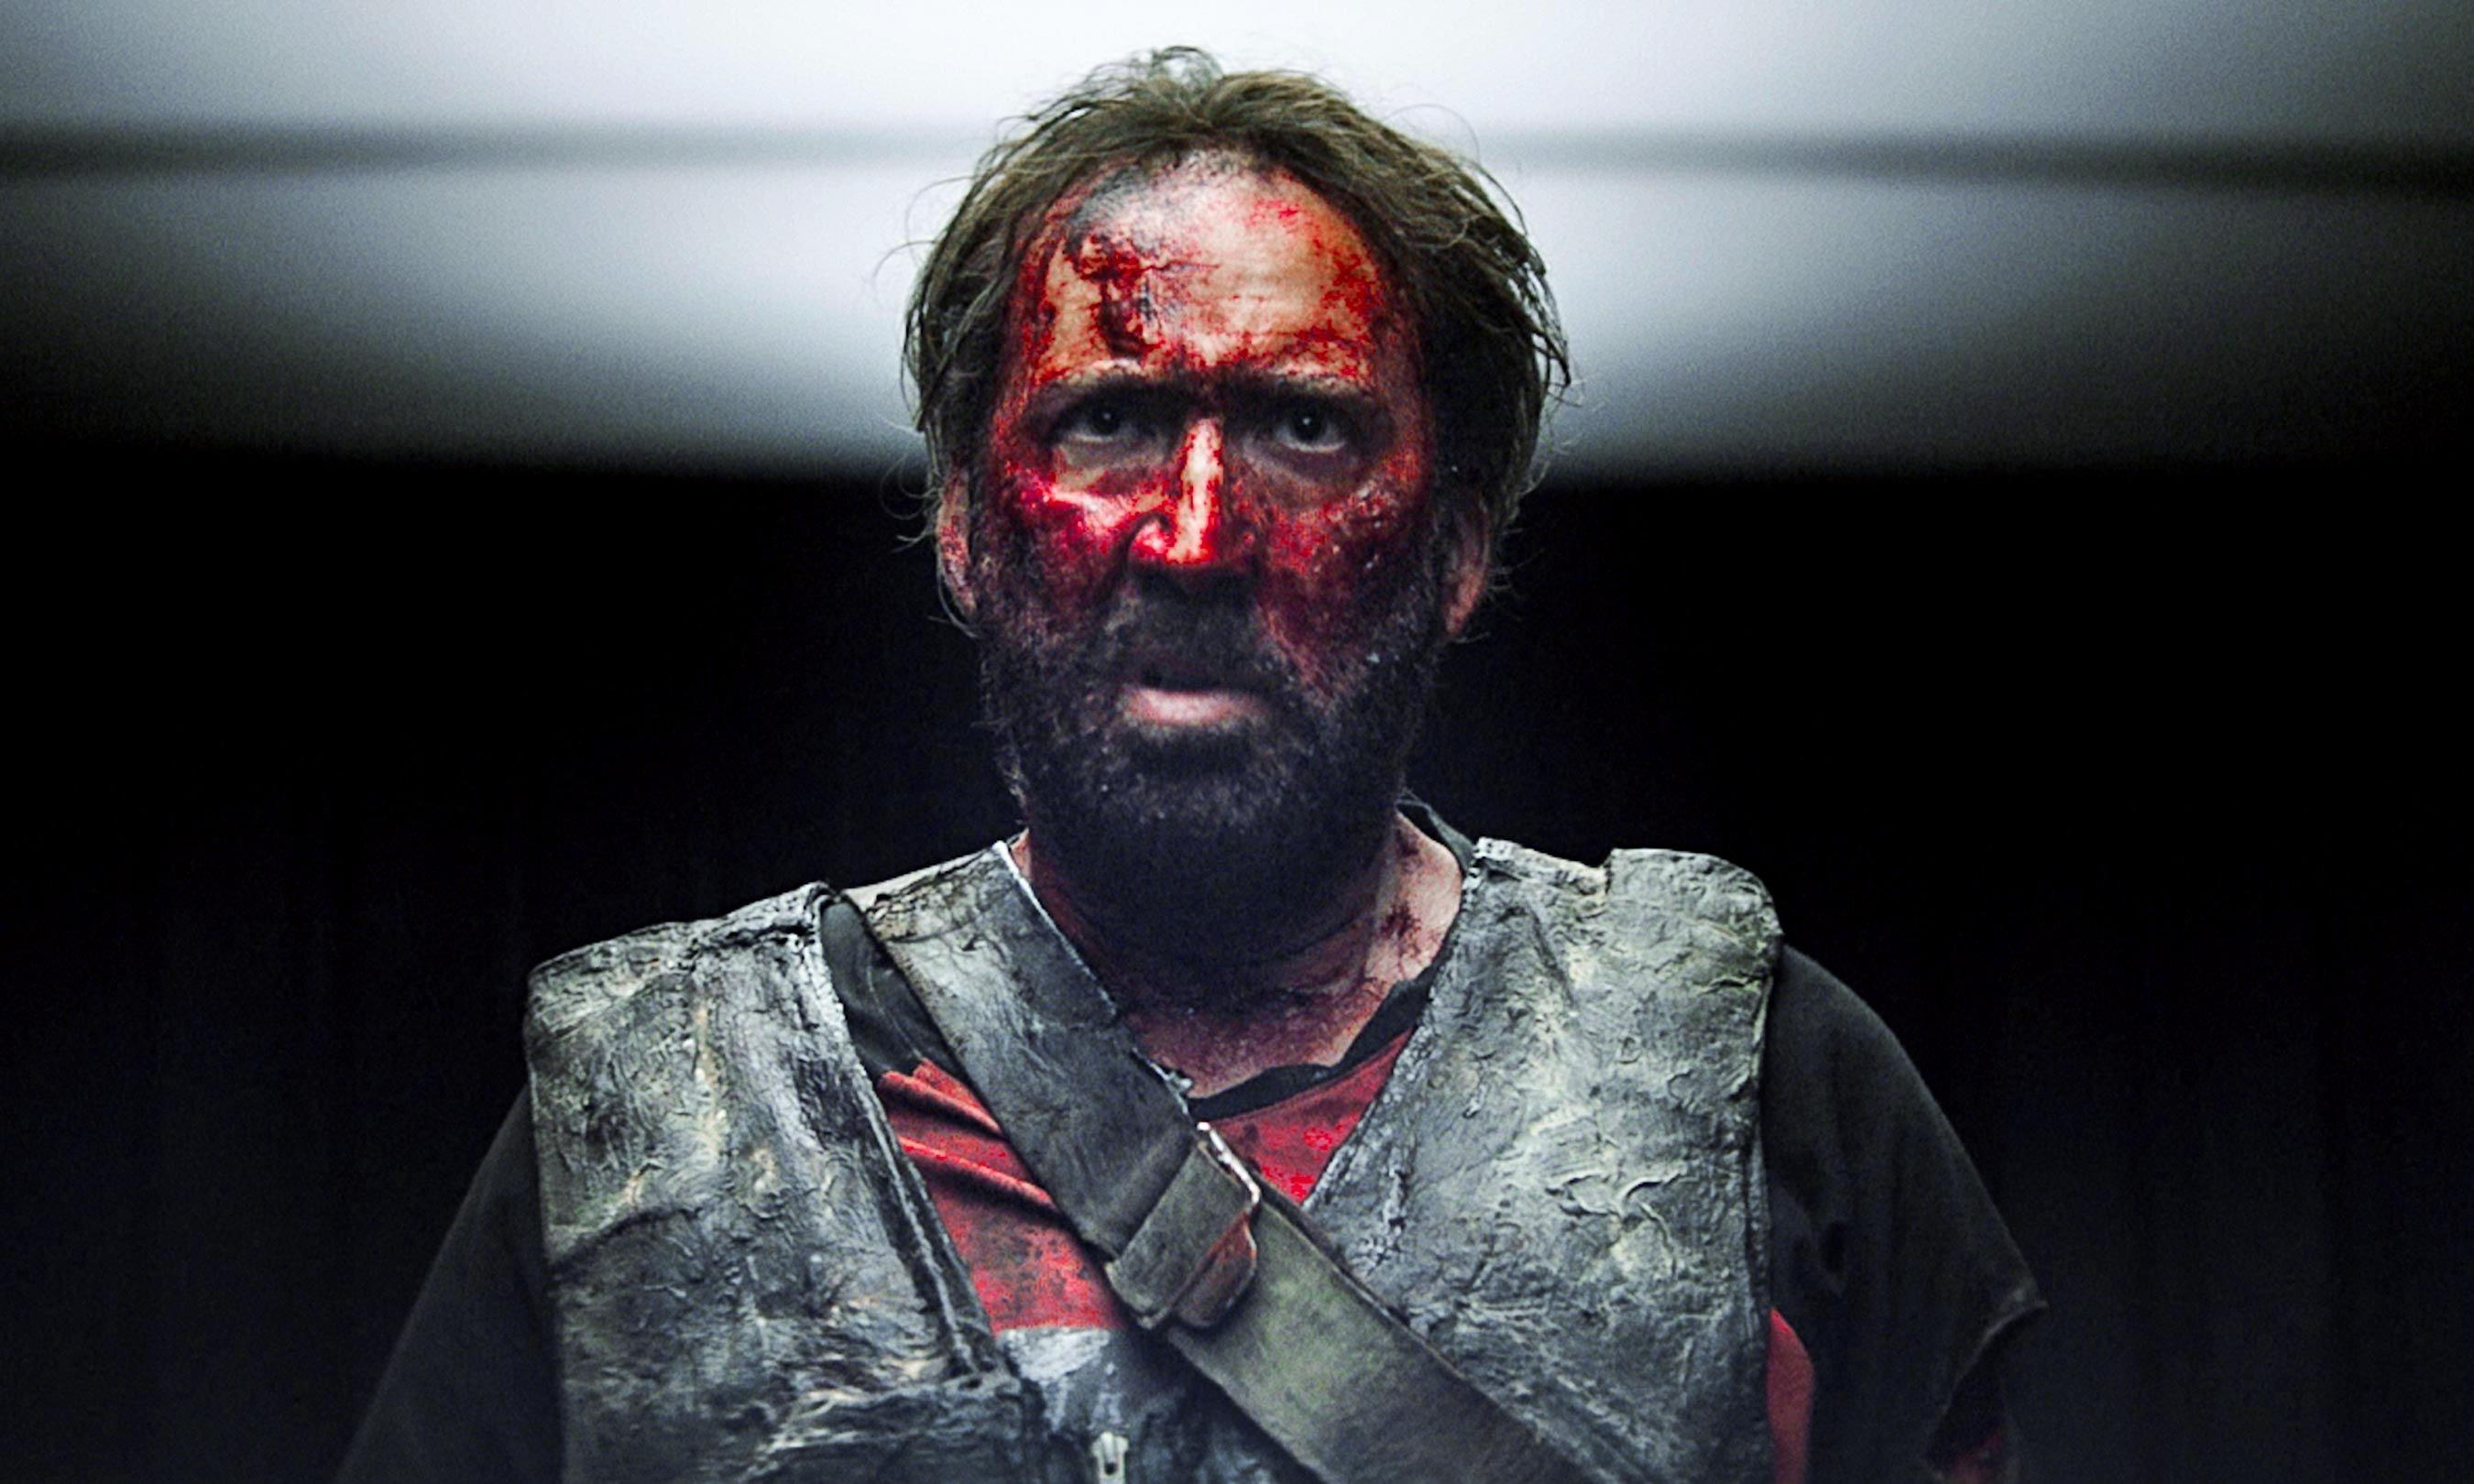 Mandy review – fabulously ferocious Nicolas Cage revenge horror